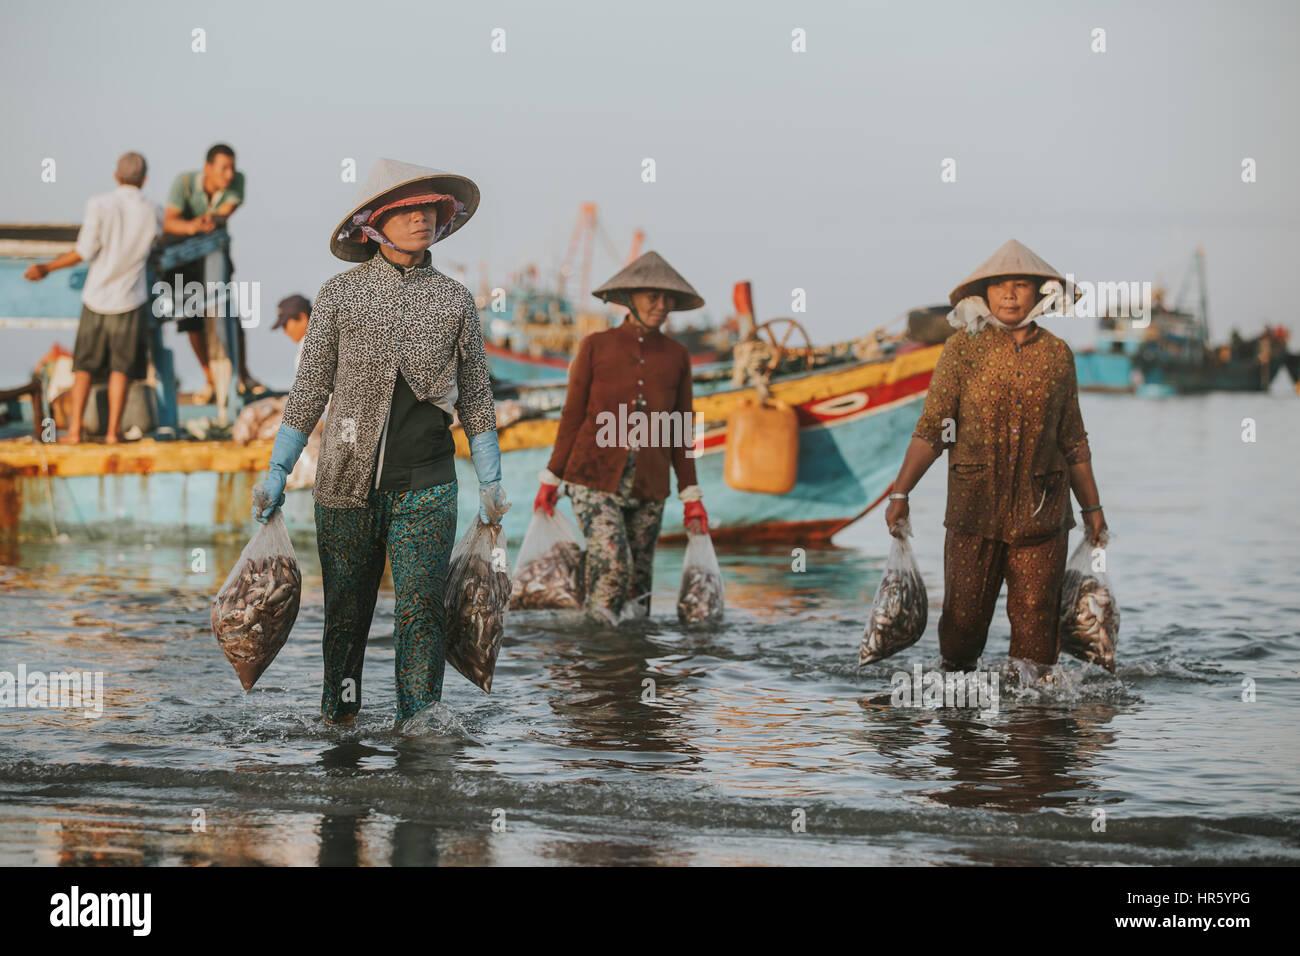 PHAN THIET, VIETNAM - November 9, 2016: Fishermen in Phan Thiet on November 9, 2016, Vietnam. Stock Photo